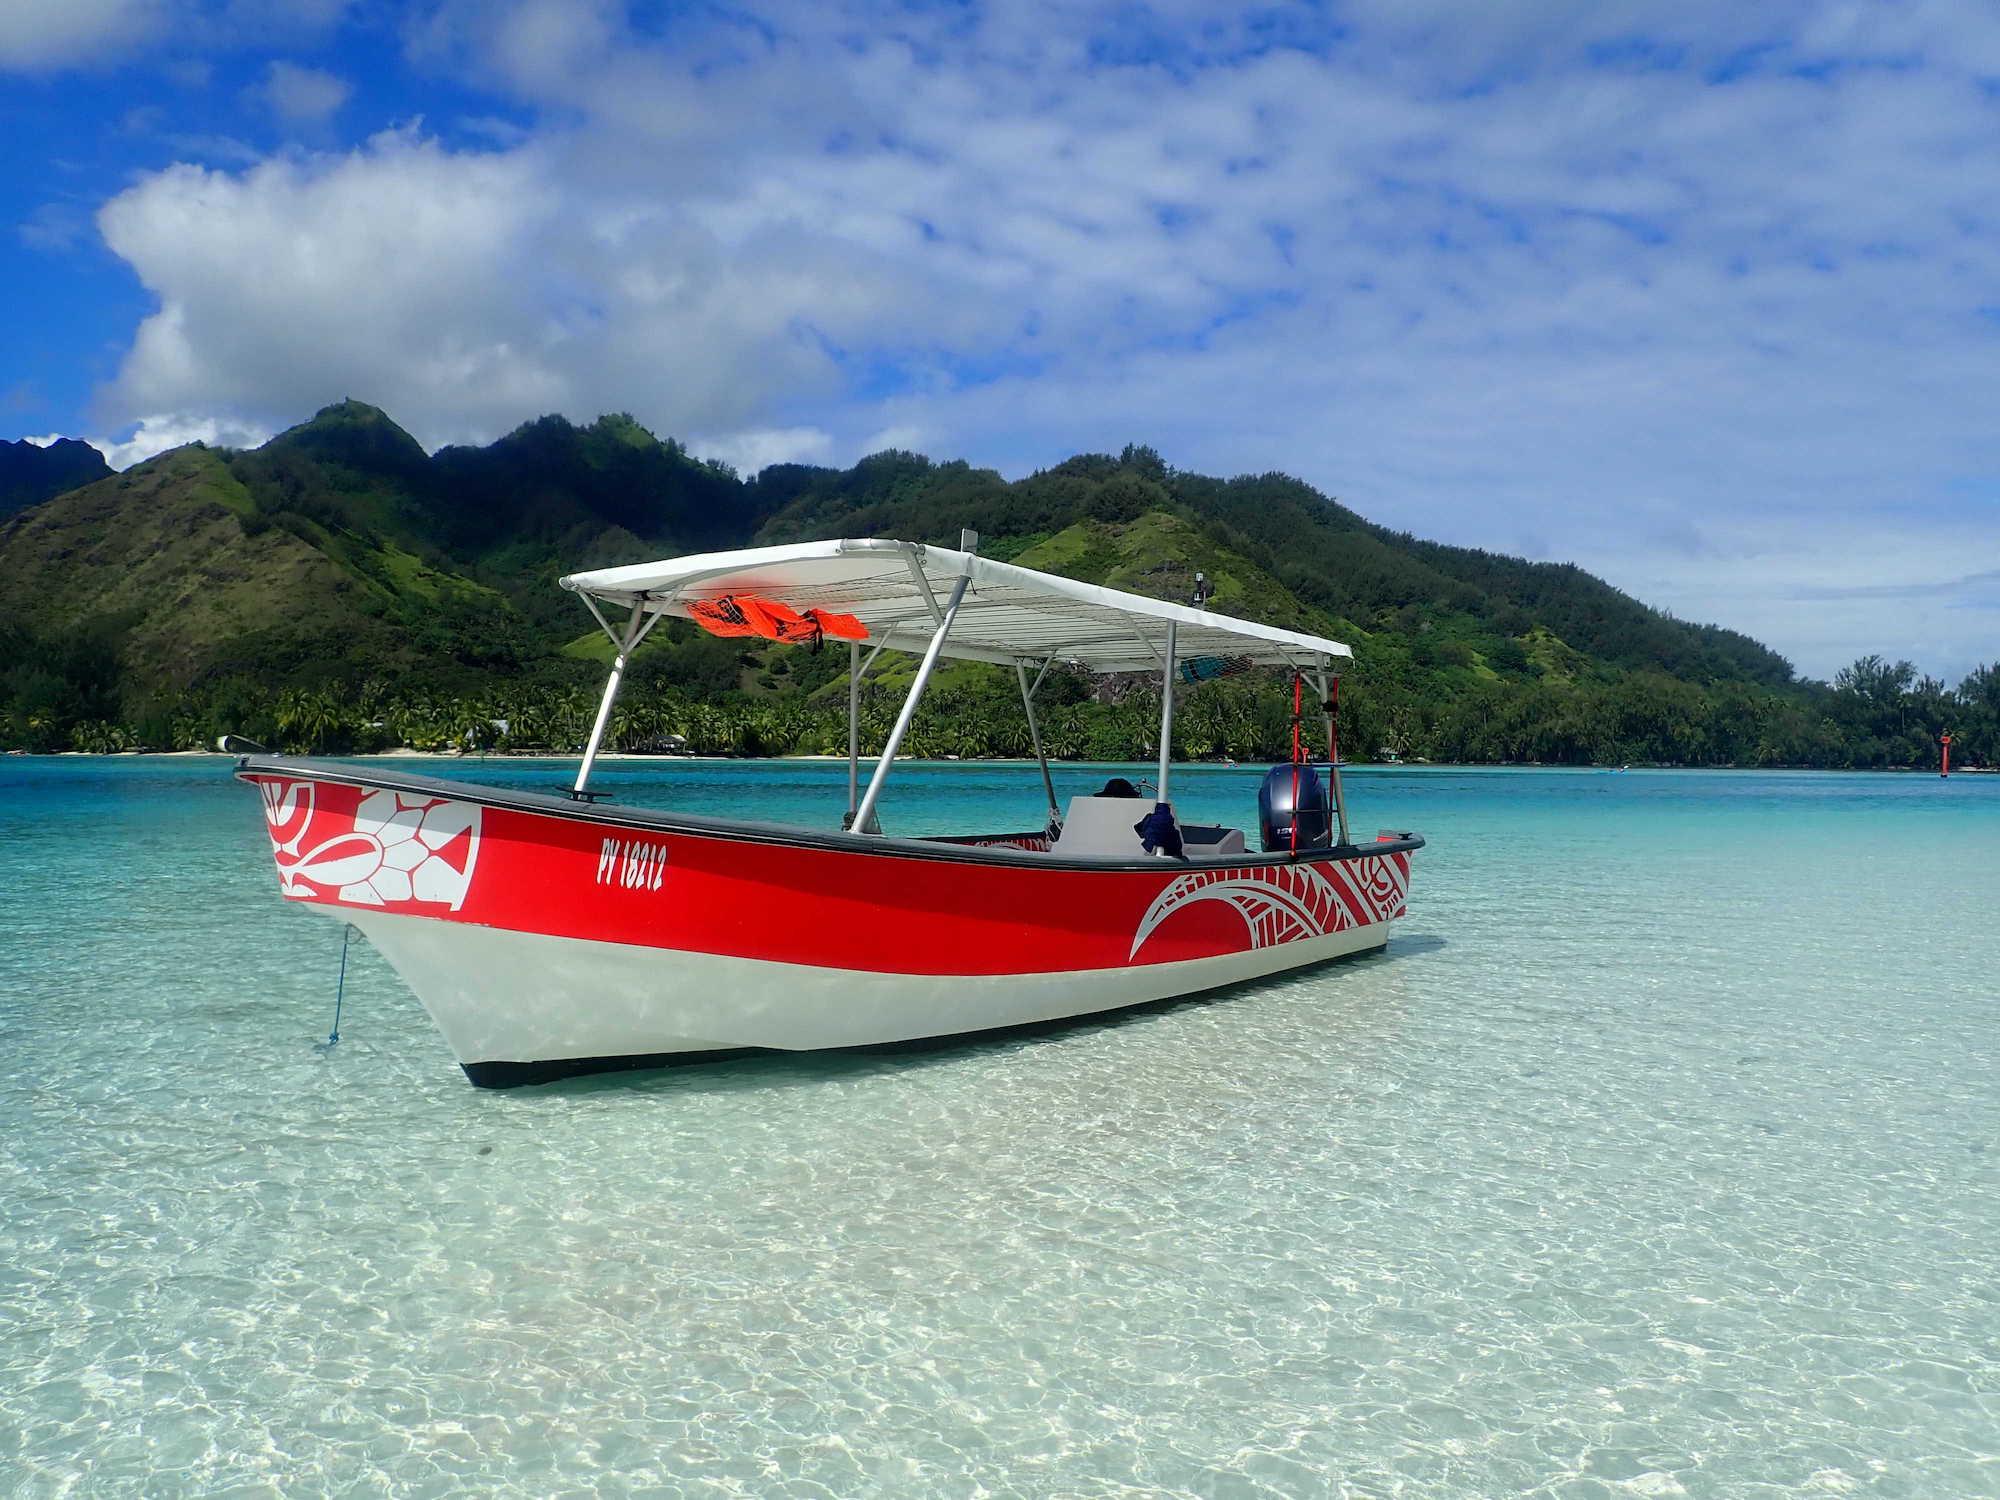 https://tahititourisme.ch/wp-content/uploads/2020/09/Boat-Hinaloa.jpg